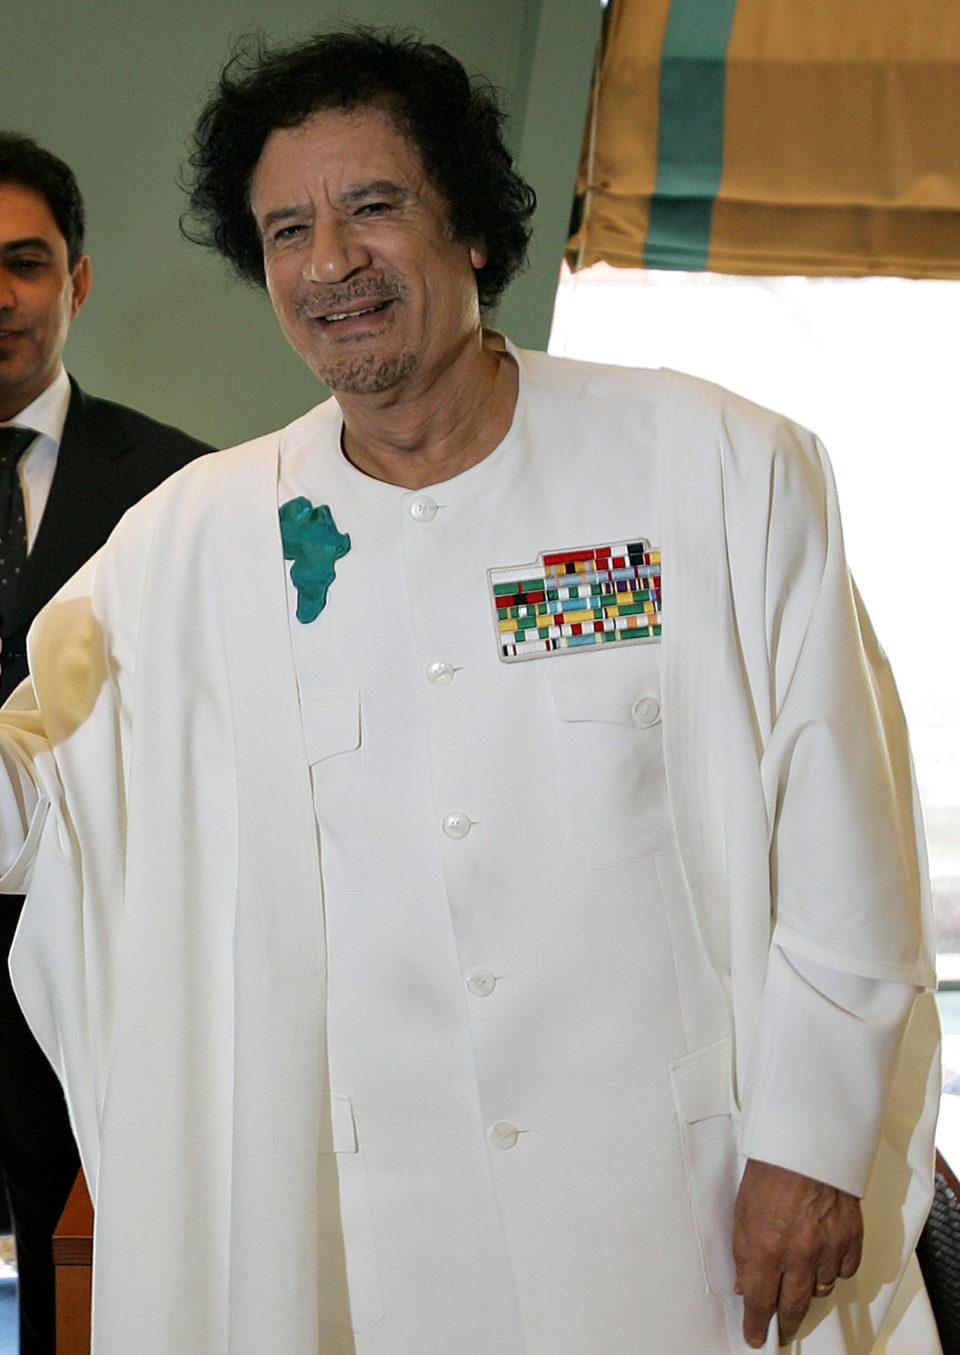 Gaddafi Scam By Ricardo Stuckert/PR - Agência Brasil [1], CC BY 3.0 br, https://commons.wikimedia.org/w/index.php?curid=2239934